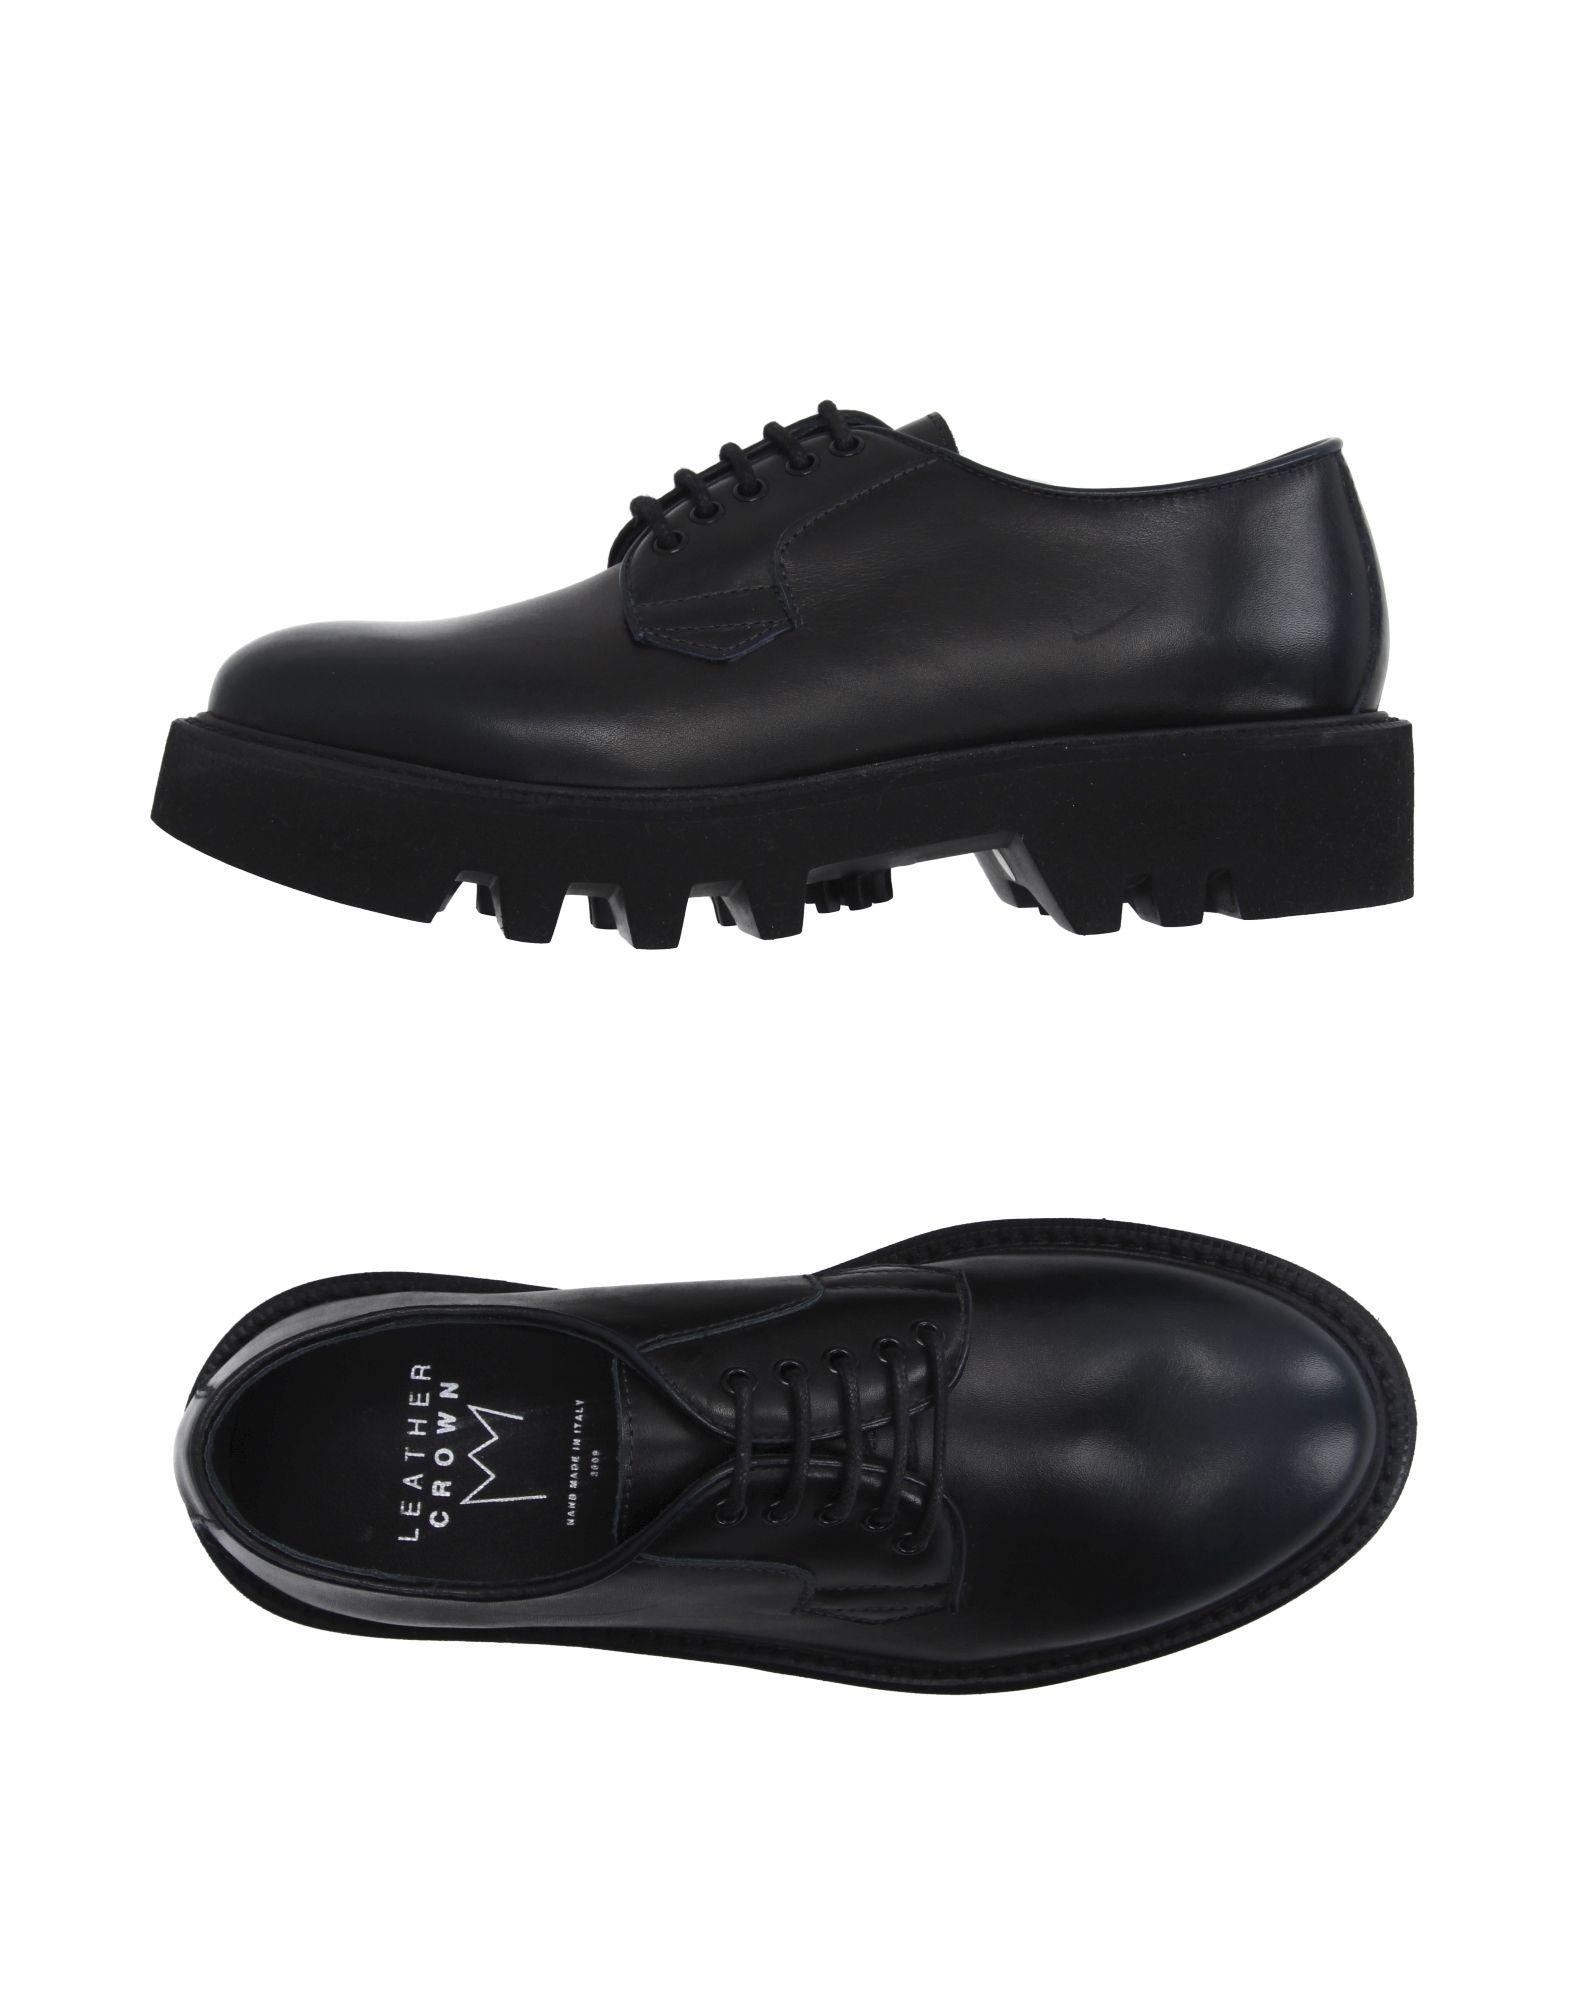 Фото - LEATHER CROWN Обувь на шнурках обувь на высокой платформе dkny